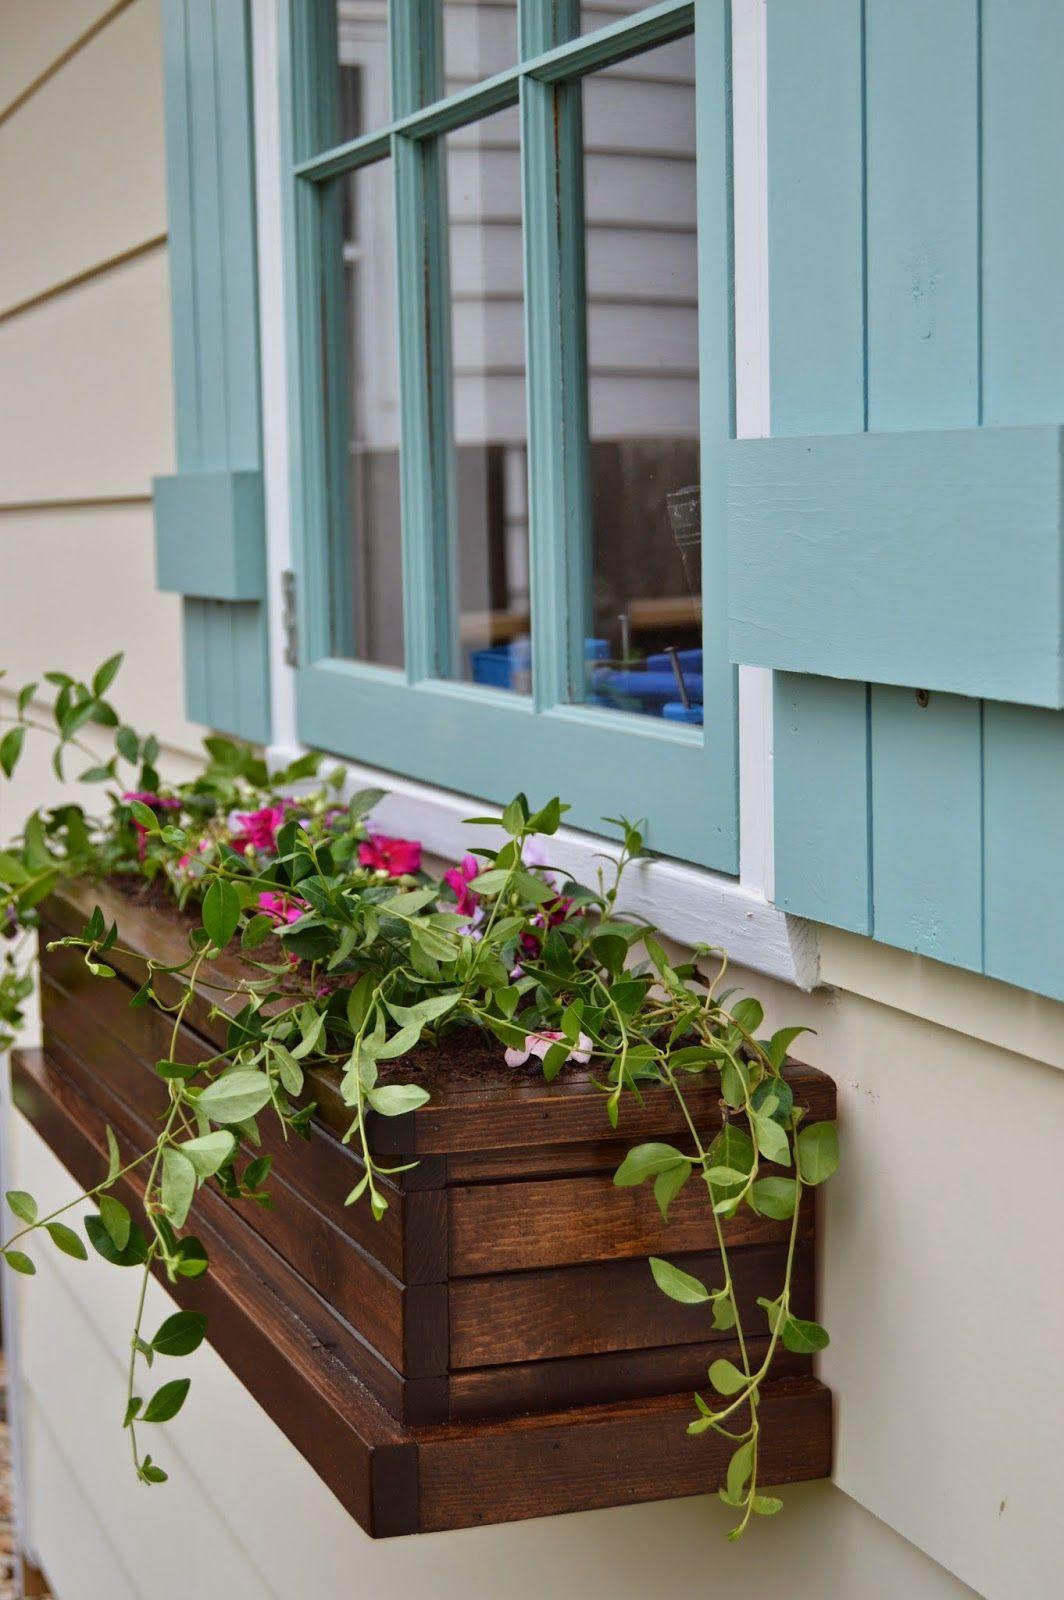 Kruse S Workshop How To Build Flower Boxes Diy Window Box Planter Window Planter Boxes Window Boxes Diy